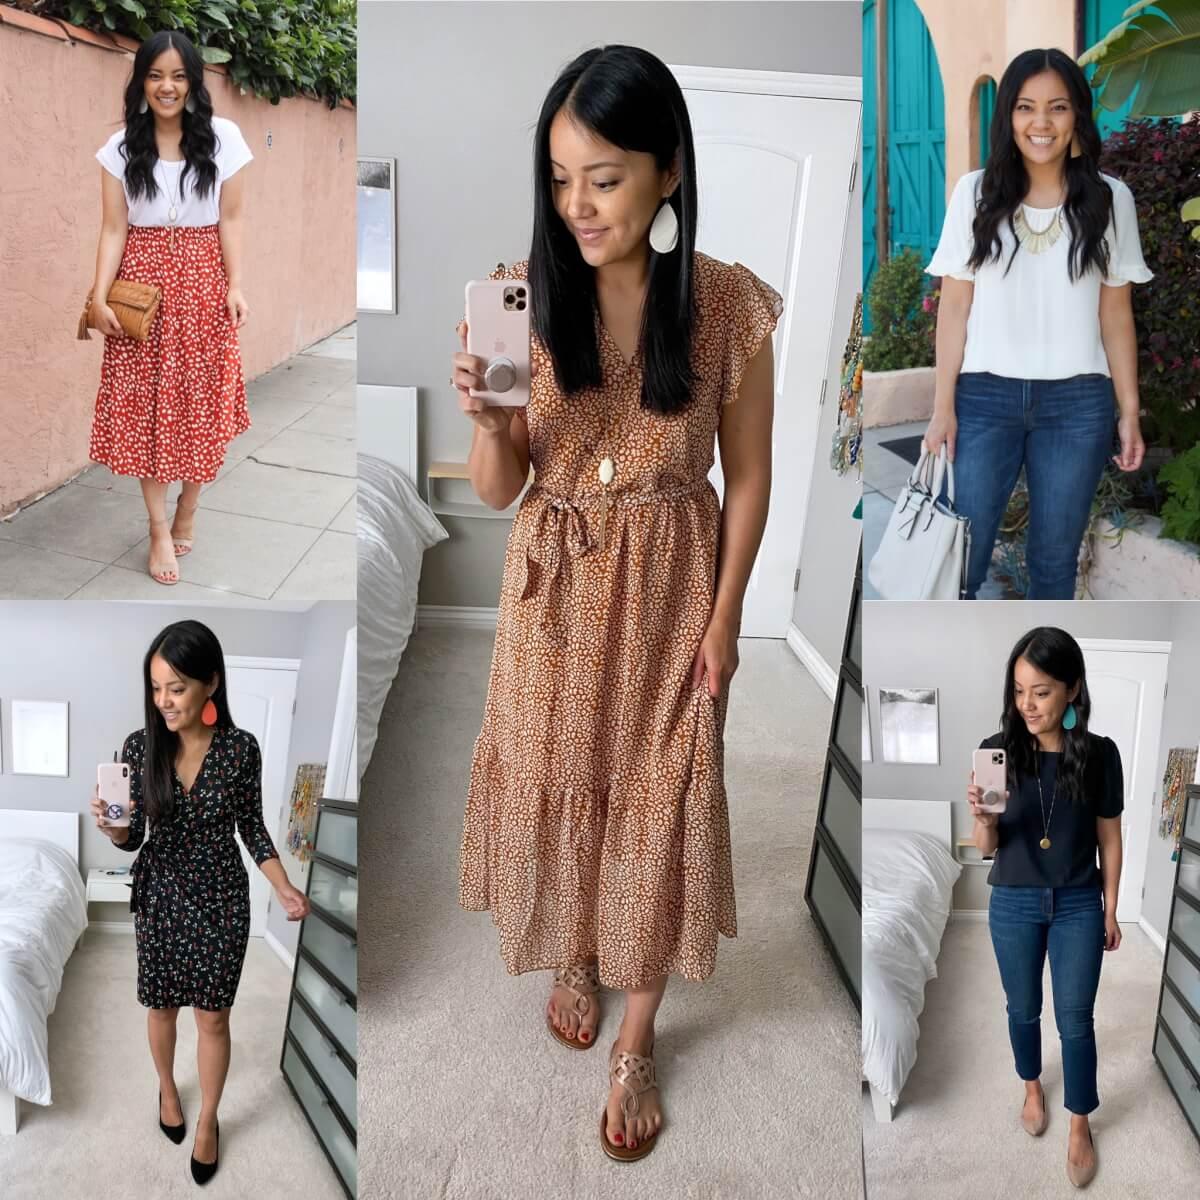 Amazon Deals: white tee + red midi skirt + cognac clutch + nude heels + bohemian rust midi dress + metallic sandals + white ruffle sleeve top + jeans + white bag + black red wrap dress + black heels + navy square neck top + nude flats